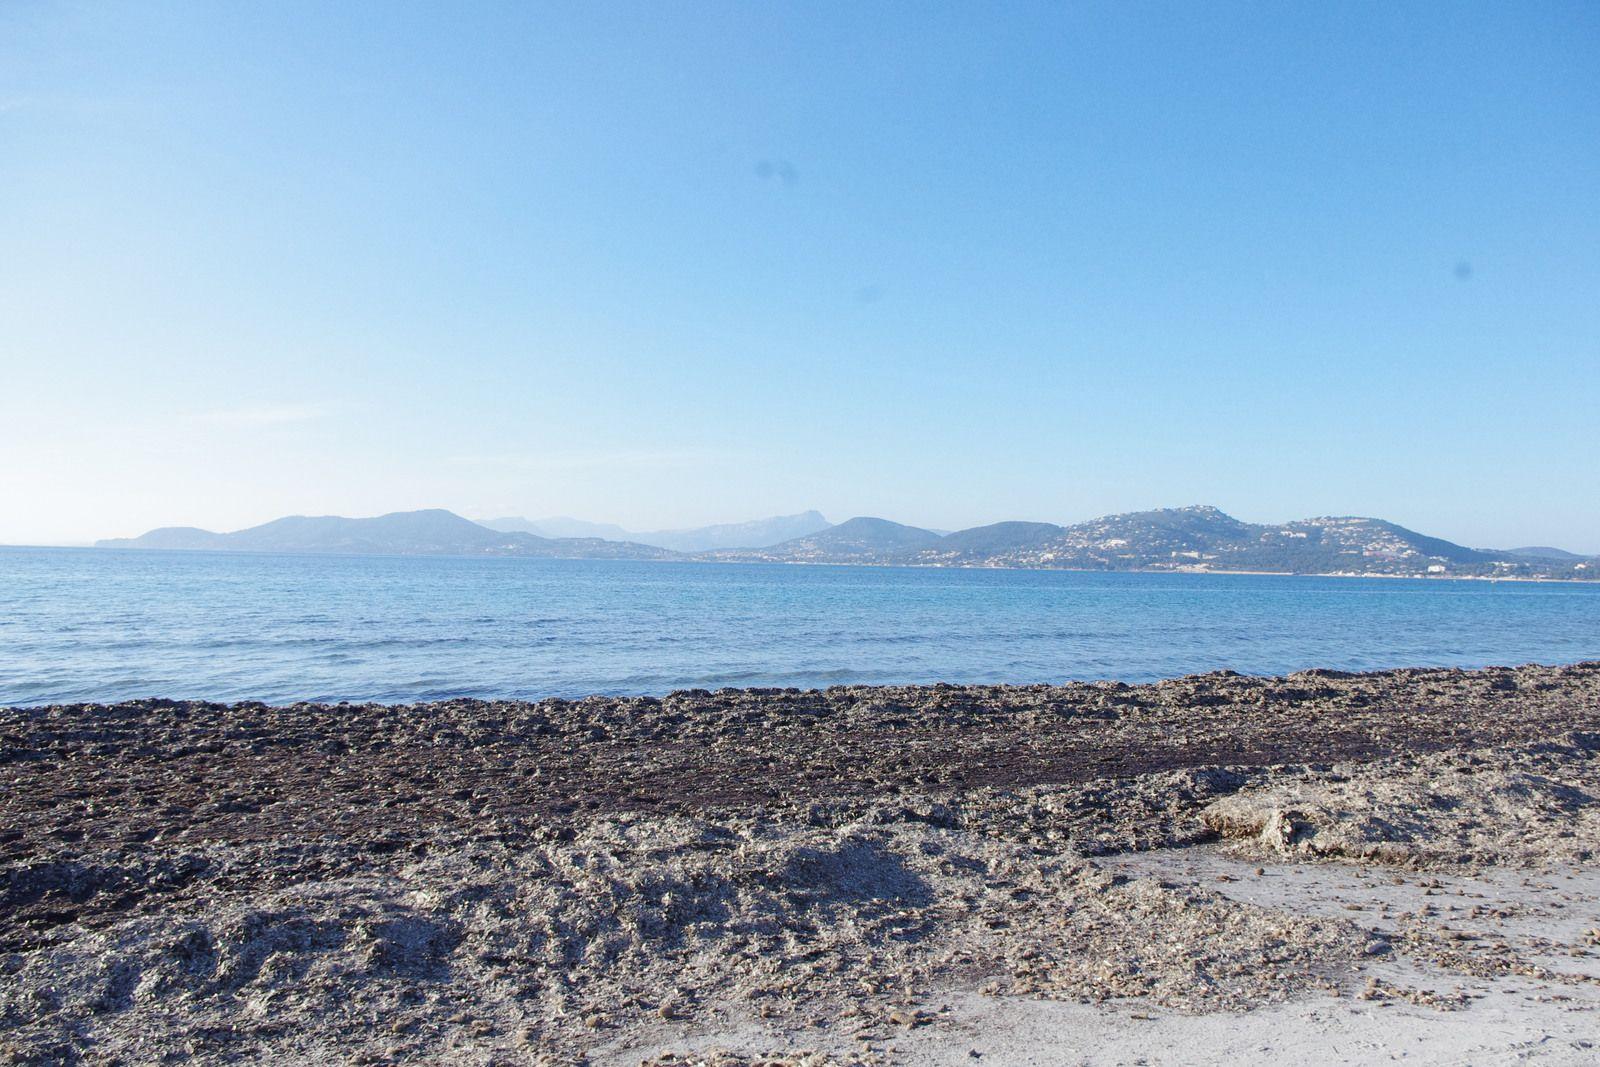 presqu'île de Giens en Burstner lyseo privilège